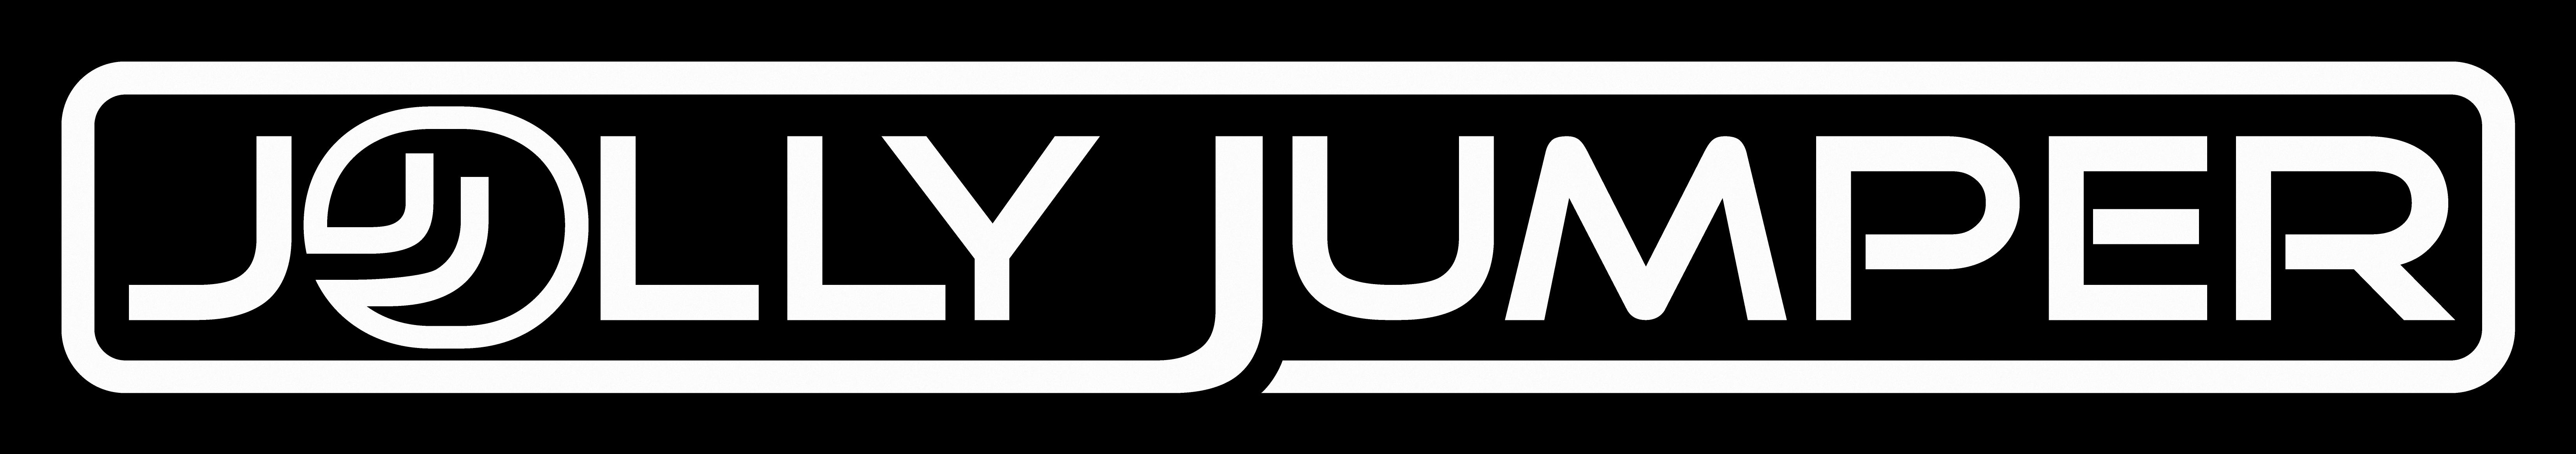 Nett Jolly Jumper Türzarge Ideen - Benutzerdefinierte Bilderrahmen ...